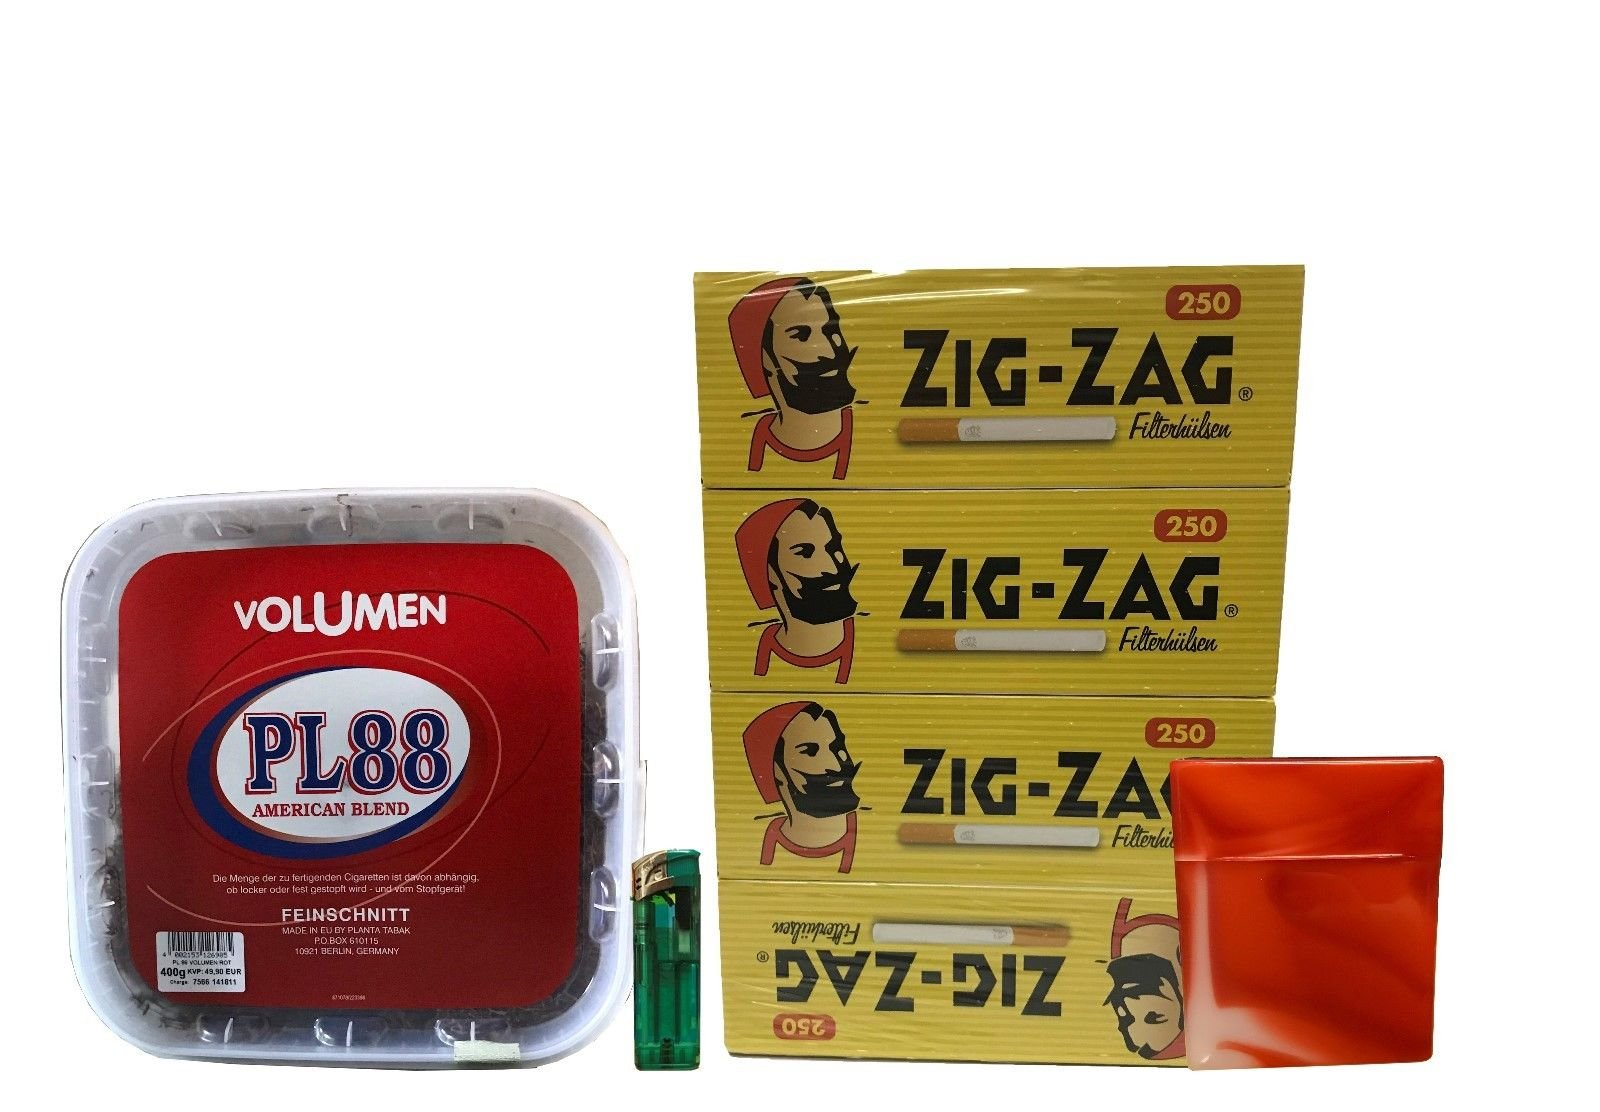 1x PL88 American Blend Tabak / Volumentabak 400g Eimer, ZigZac Hülsen, Feuerzeug